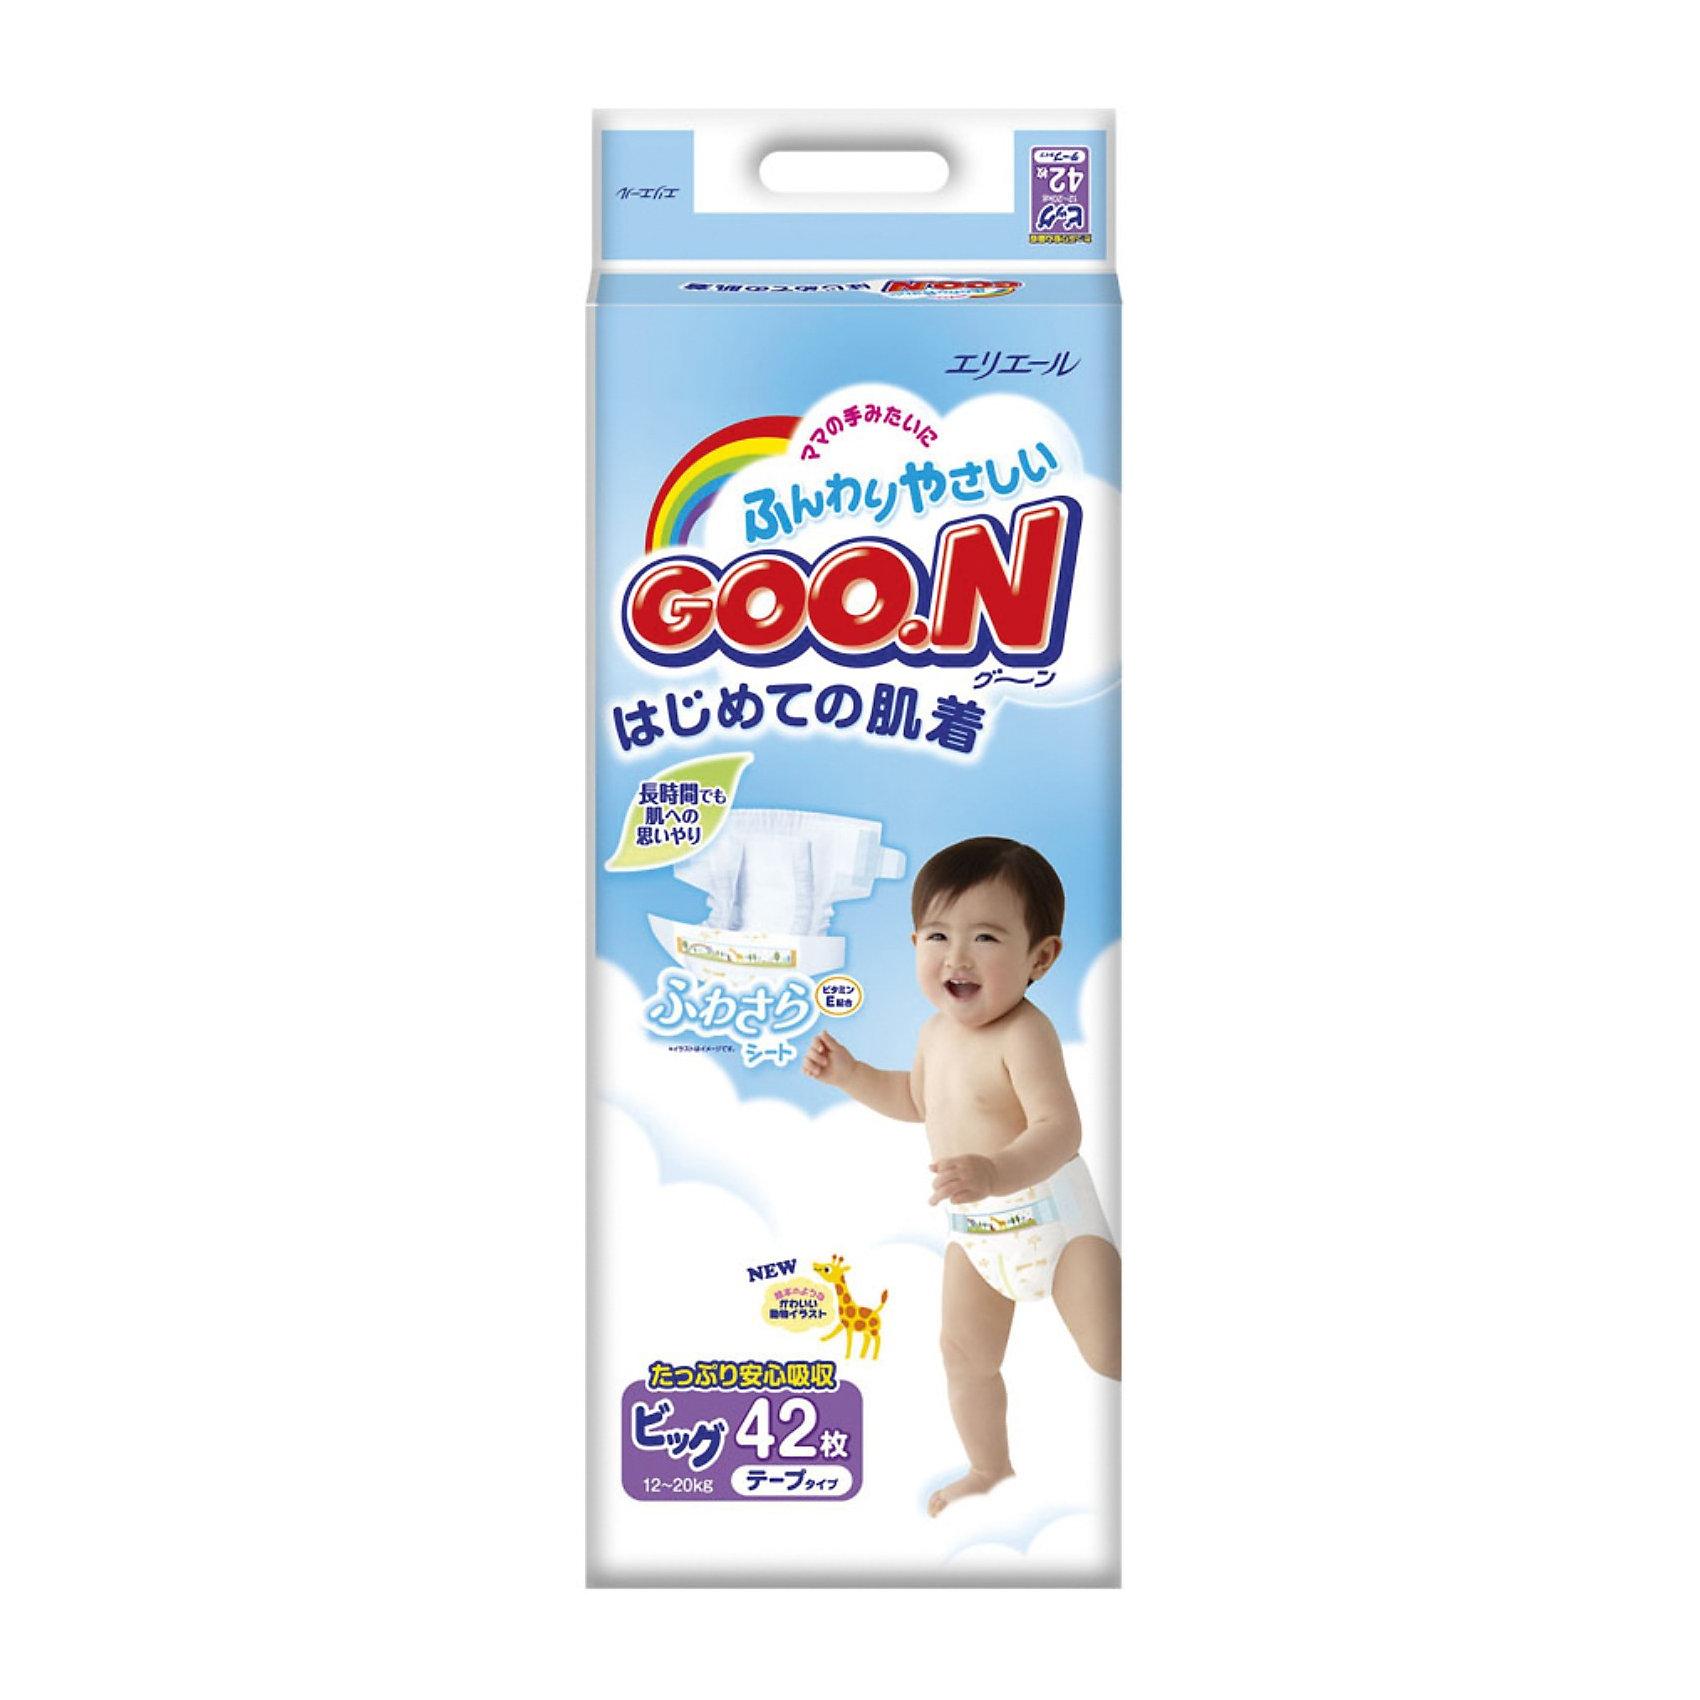 ���������� Goon, XL 12-20 ��, 42 ��.